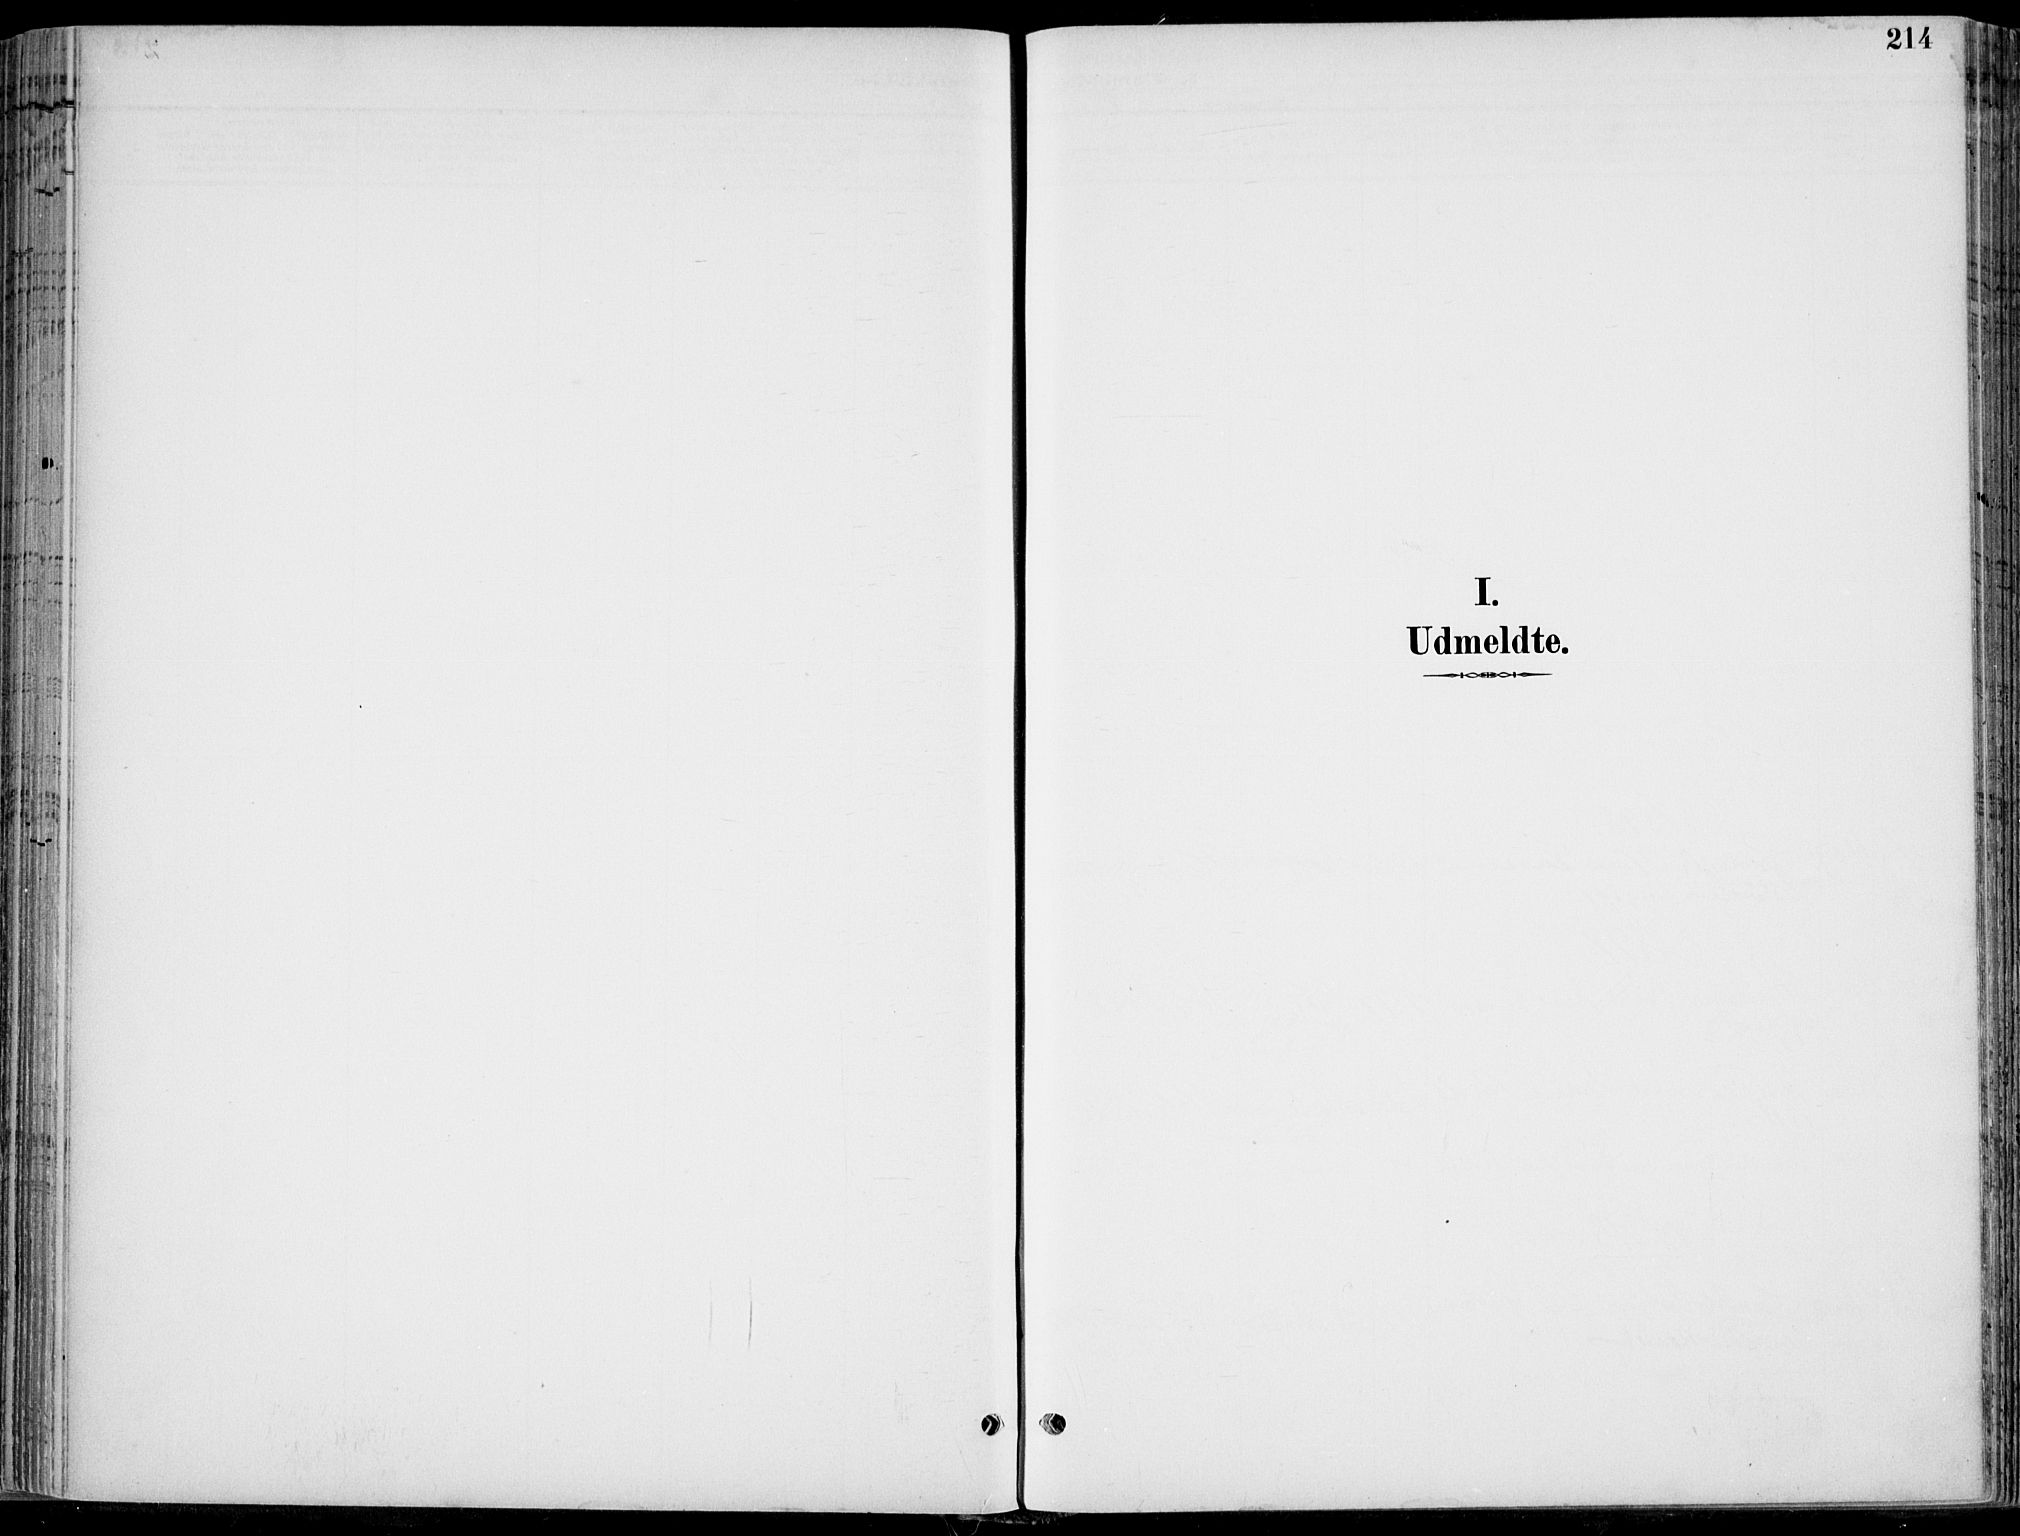 SAKO, Hole kirkebøker, F/Fa/L0009: Ministerialbok nr. I 9, 1892-1907, s. 214